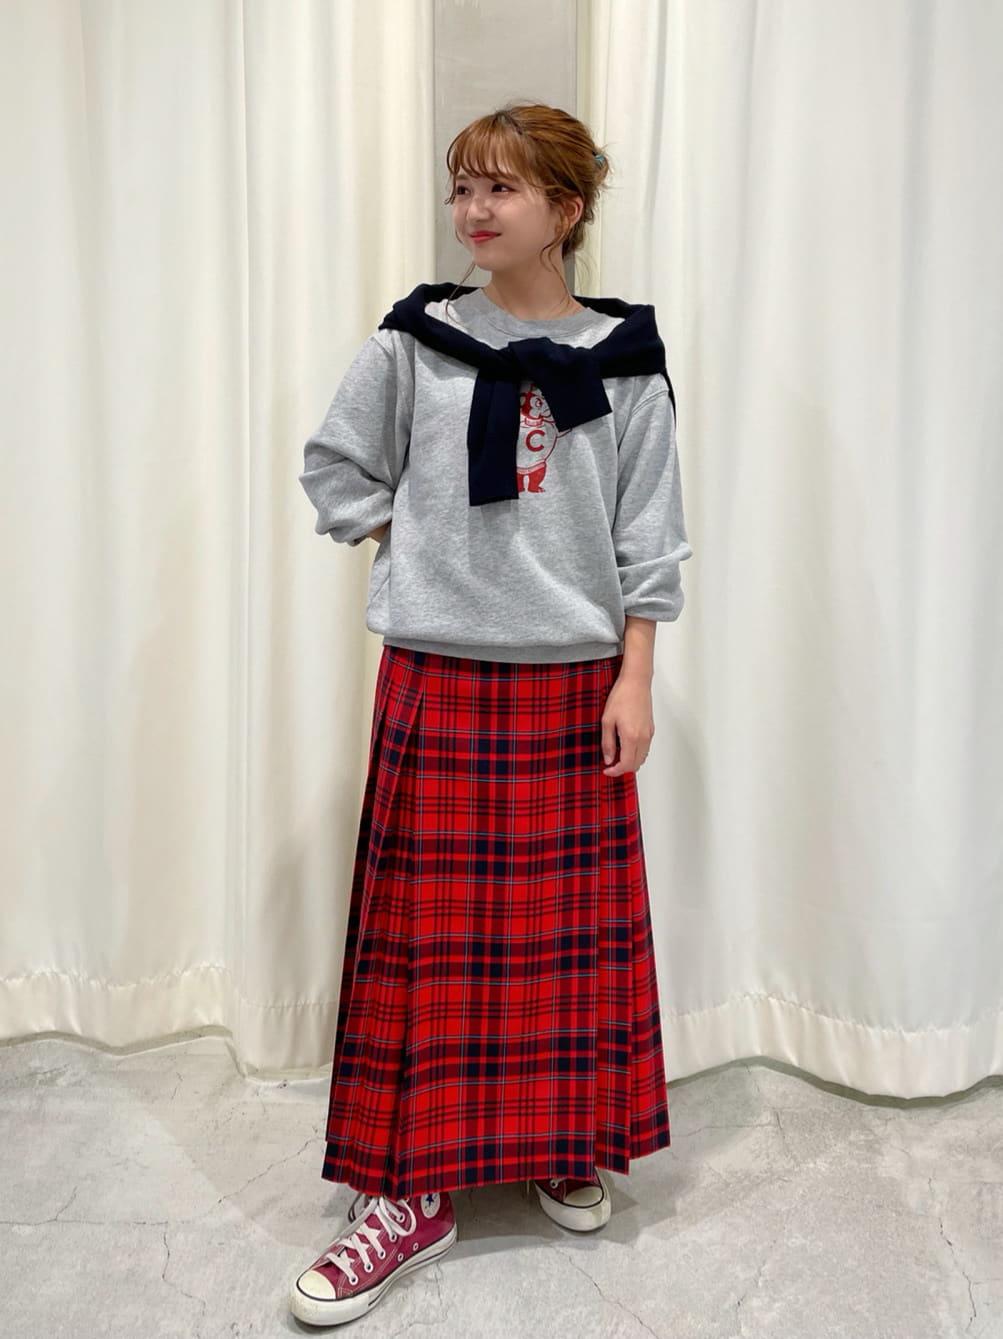 CHILD WOMAN , PAR ICI 東京スカイツリータウン・ソラマチ 2021.10.01